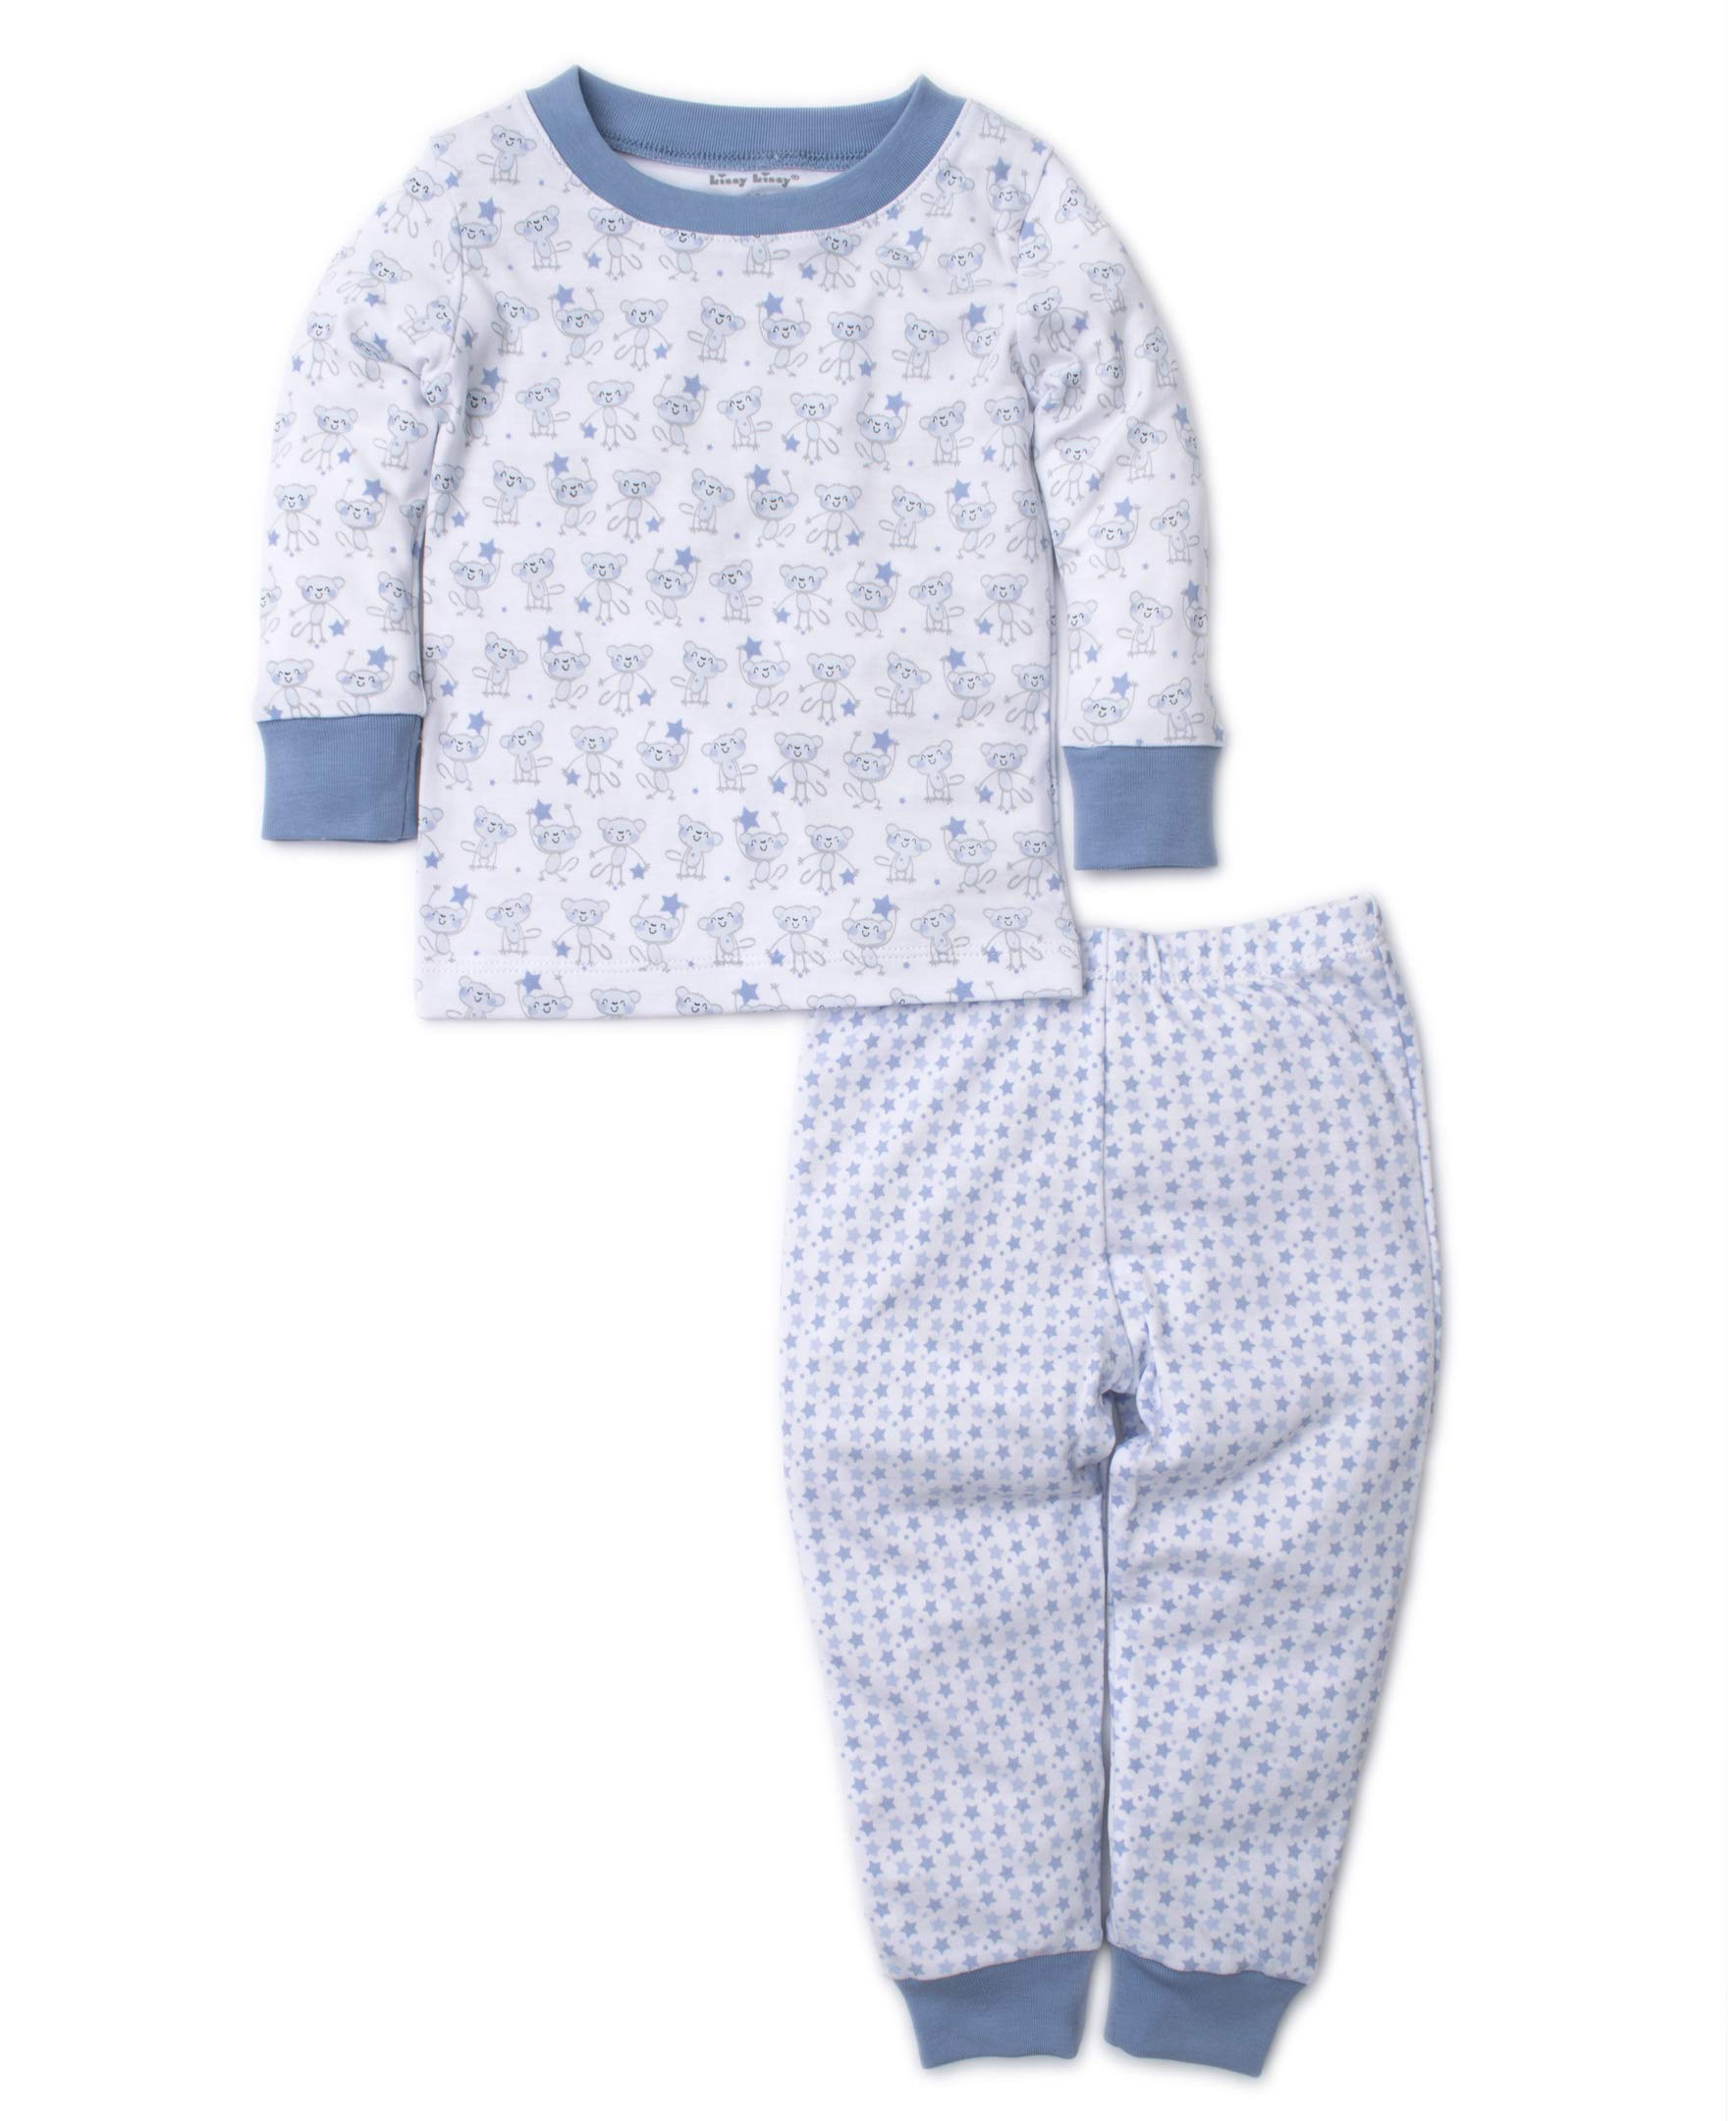 Kissy Kissy Baby-Boys Infant Monkey Moves Print Long Pajamas Set-Light Blue-12-18 Months by Kissy Kissy